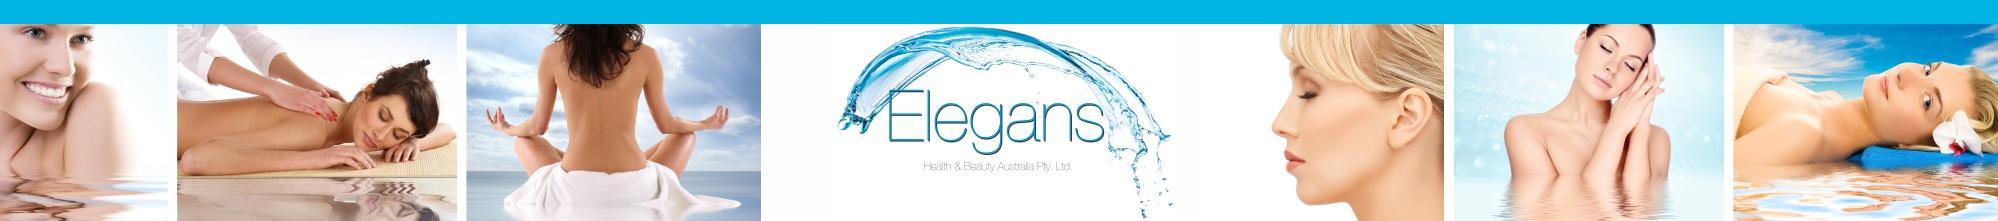 Elegans beauty salon furniture & equipment